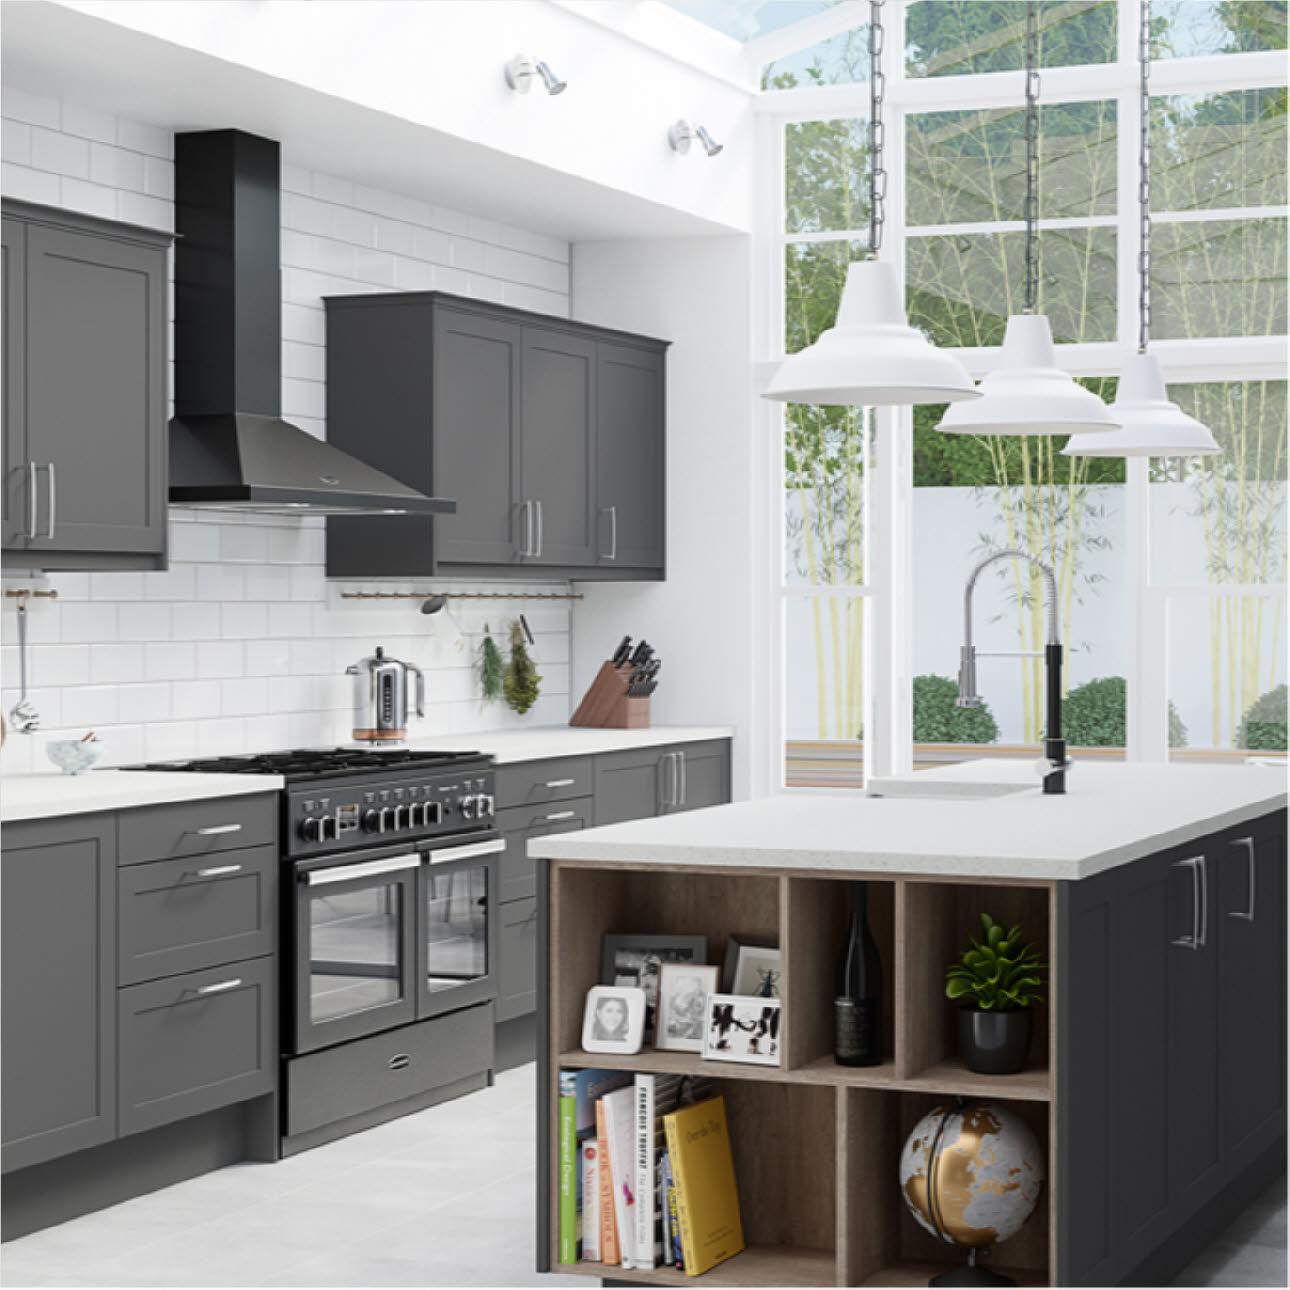 Spray Paint Kitchen Cabinets London